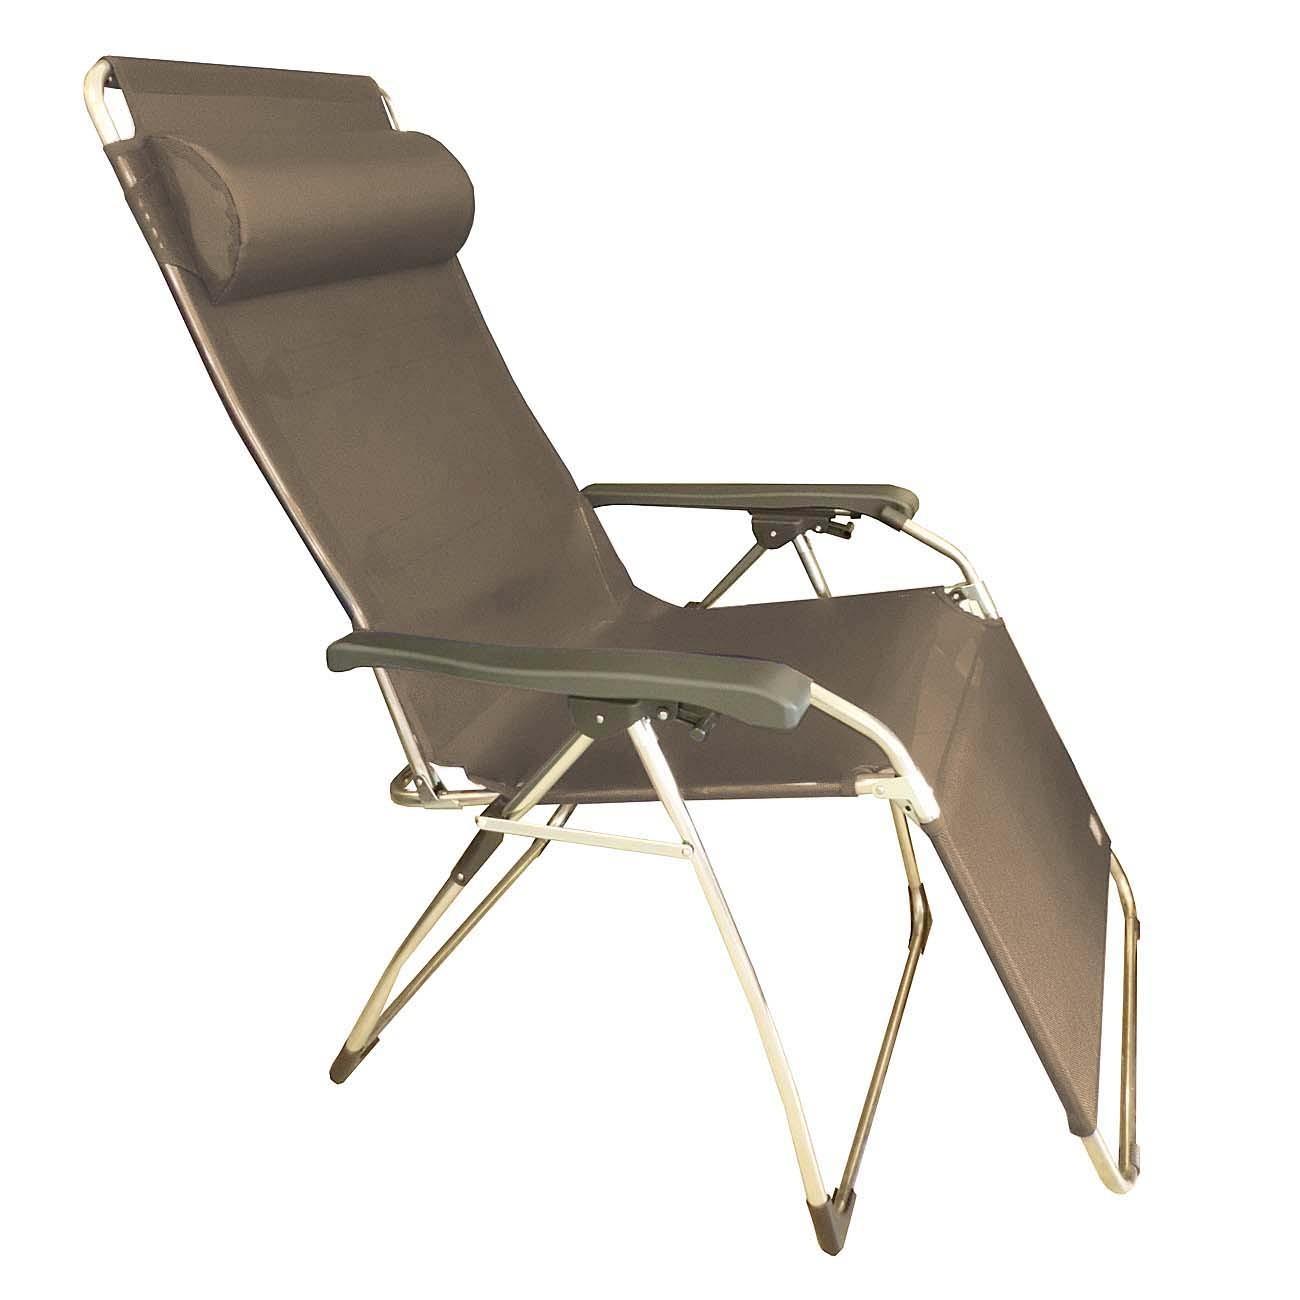 fiam liegestuhle alles ber wohndesign und m belideen. Black Bedroom Furniture Sets. Home Design Ideas